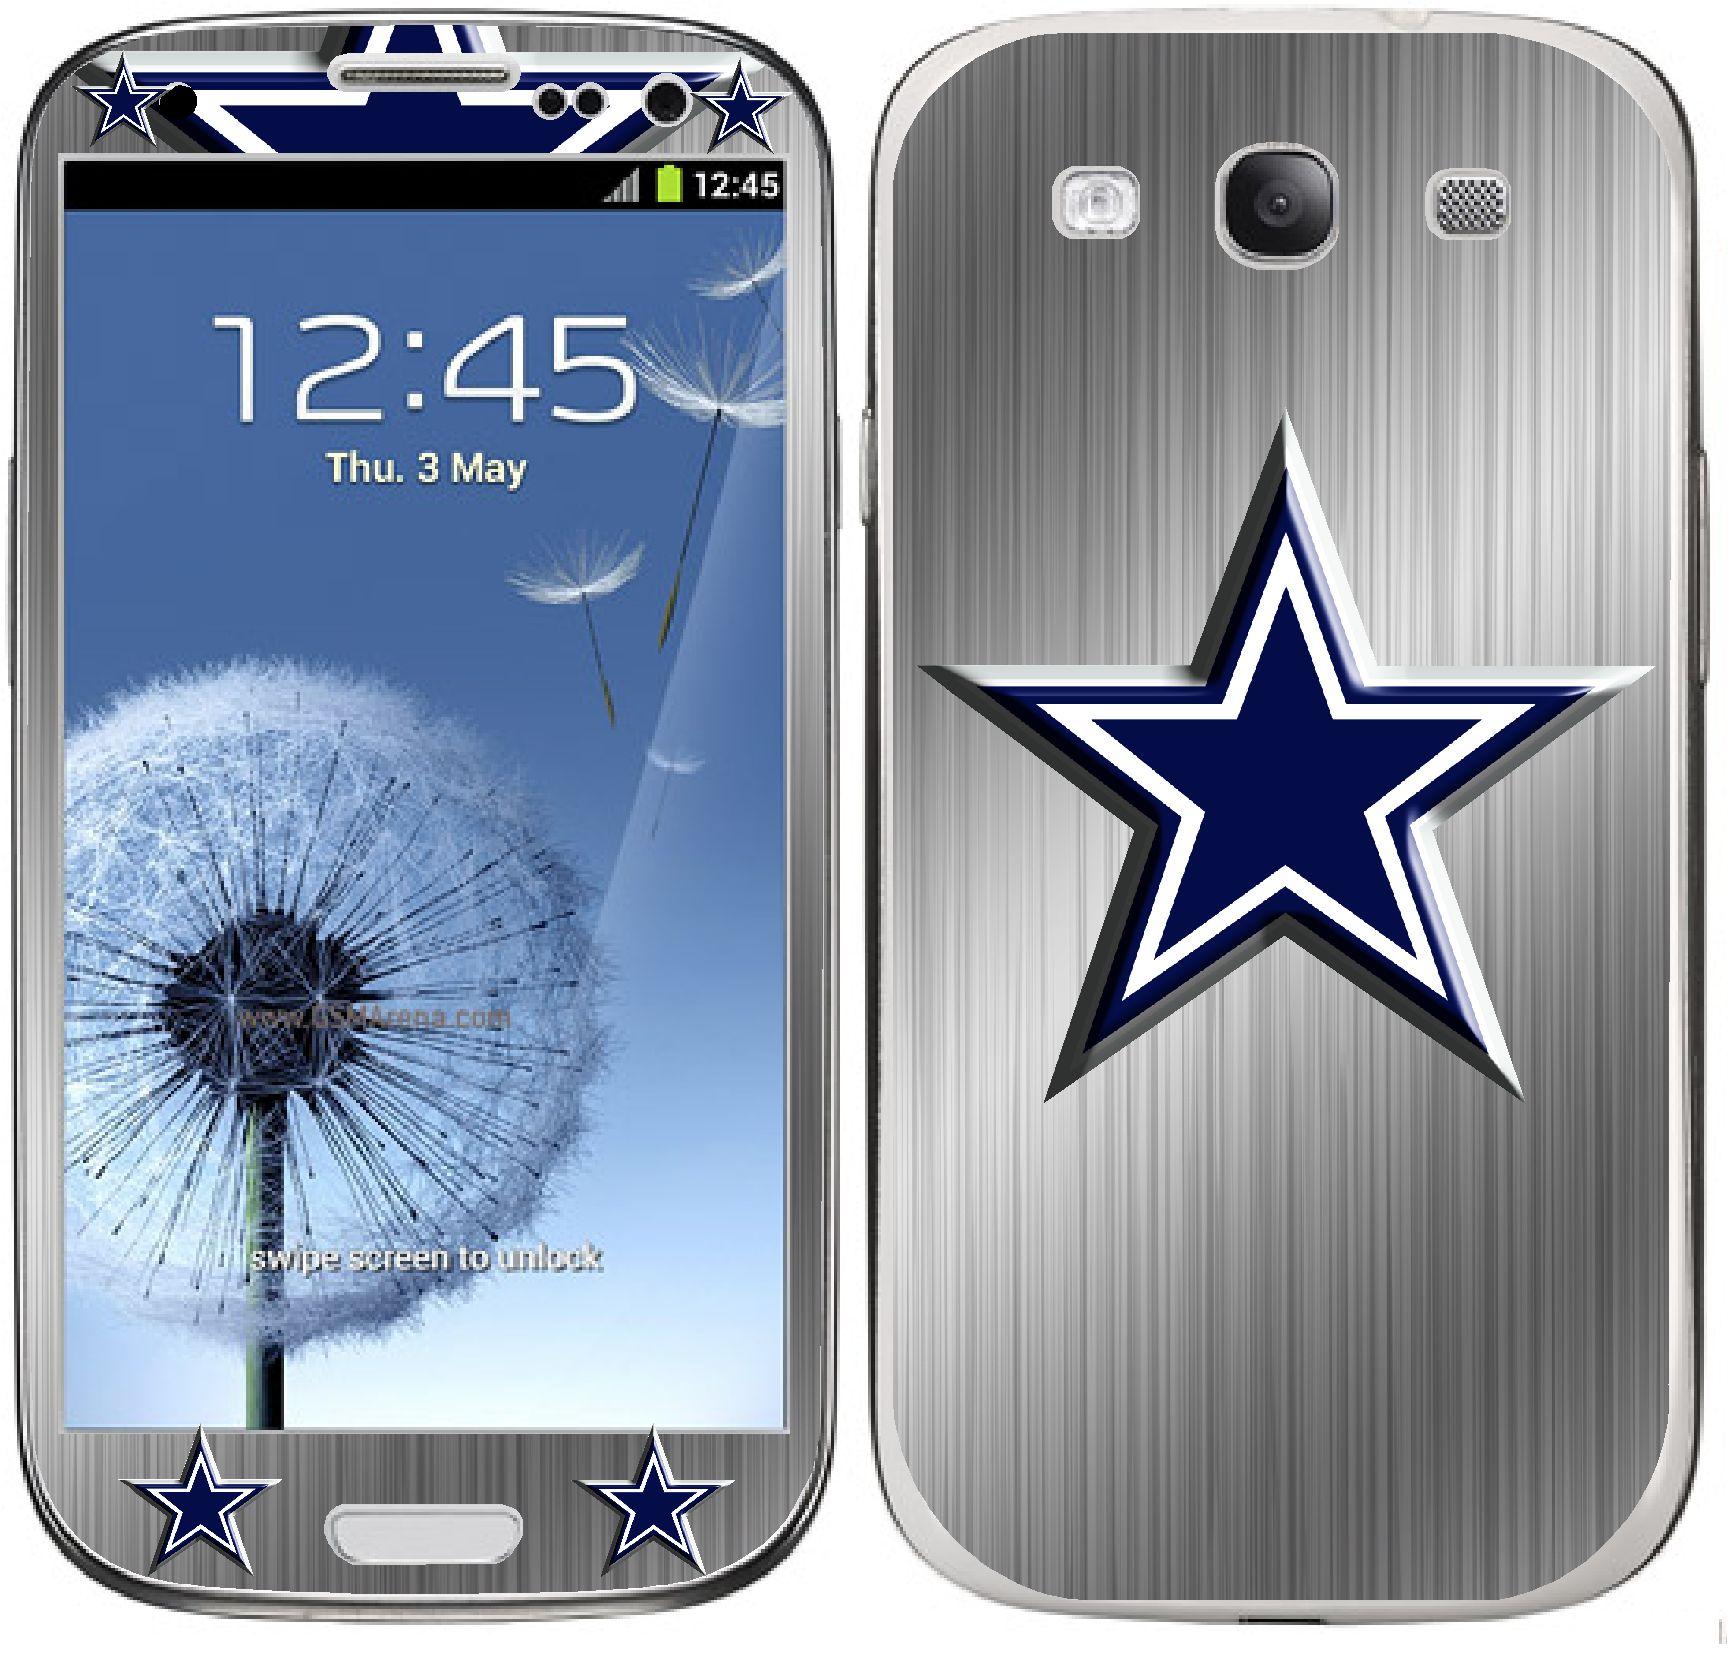 Samsung Galaxy S3 Dallas Cowboys Brushed Decal Skin On